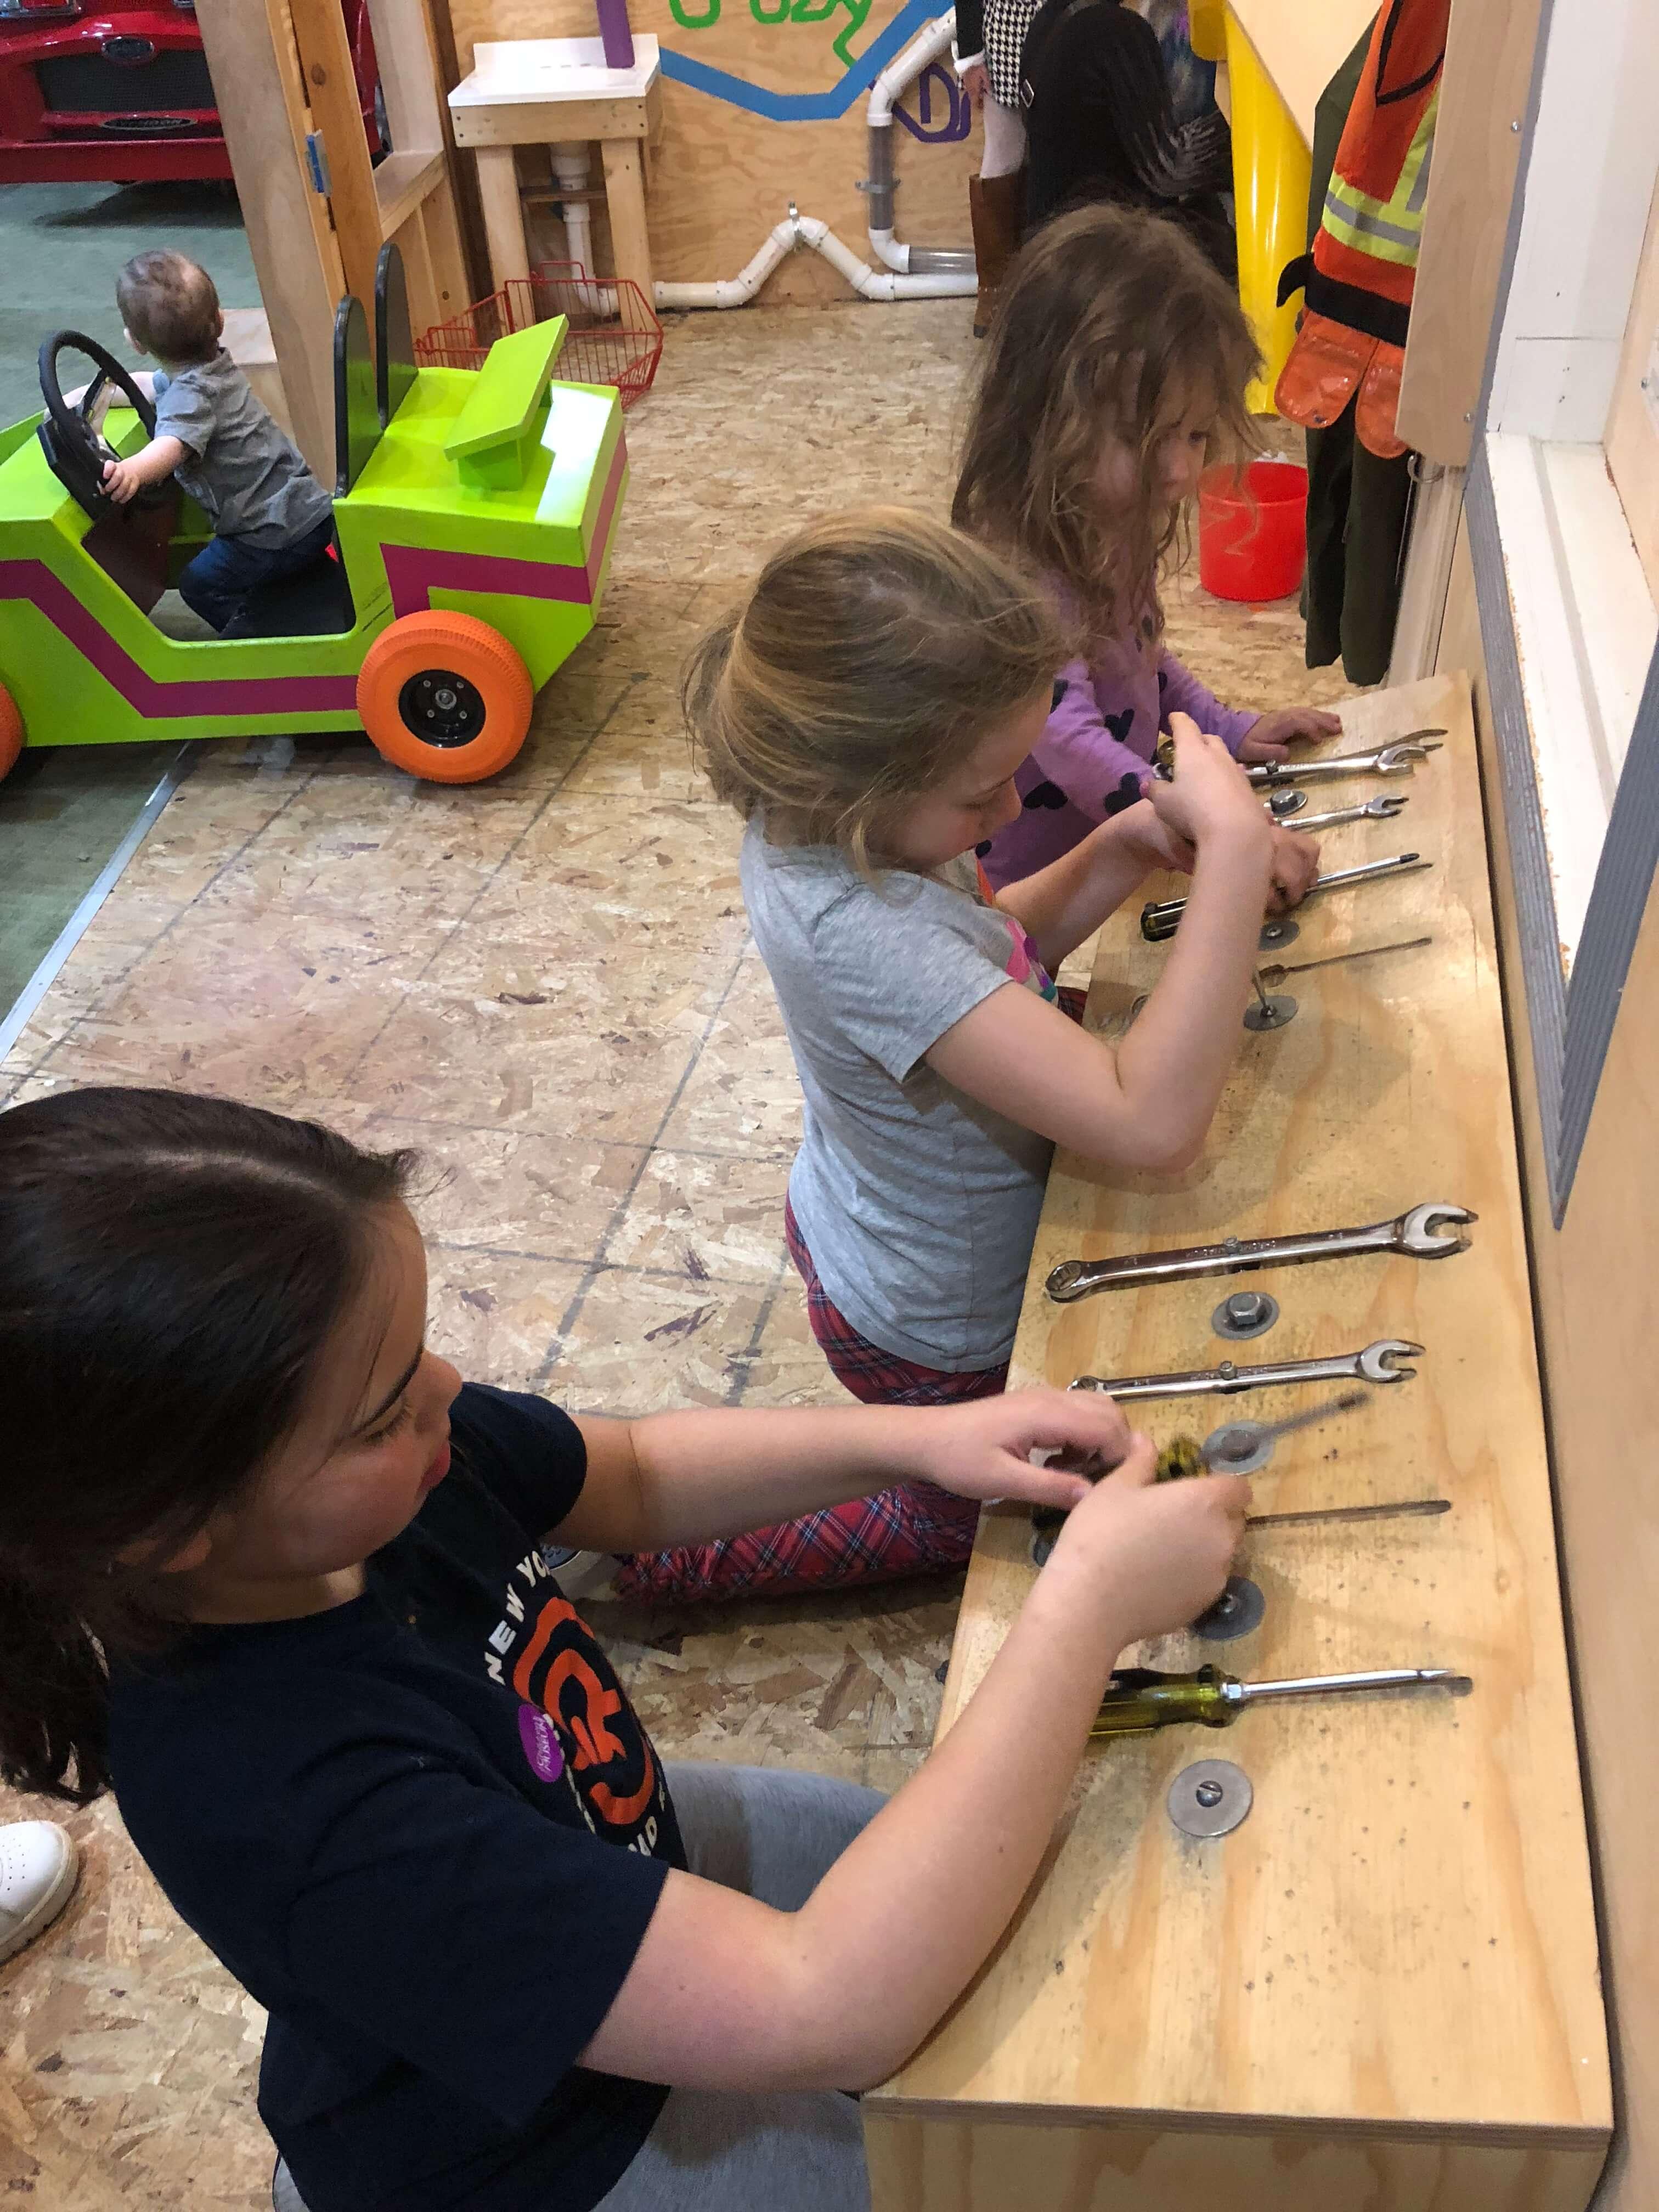 builder station at Mid-Hudson Children's Museum